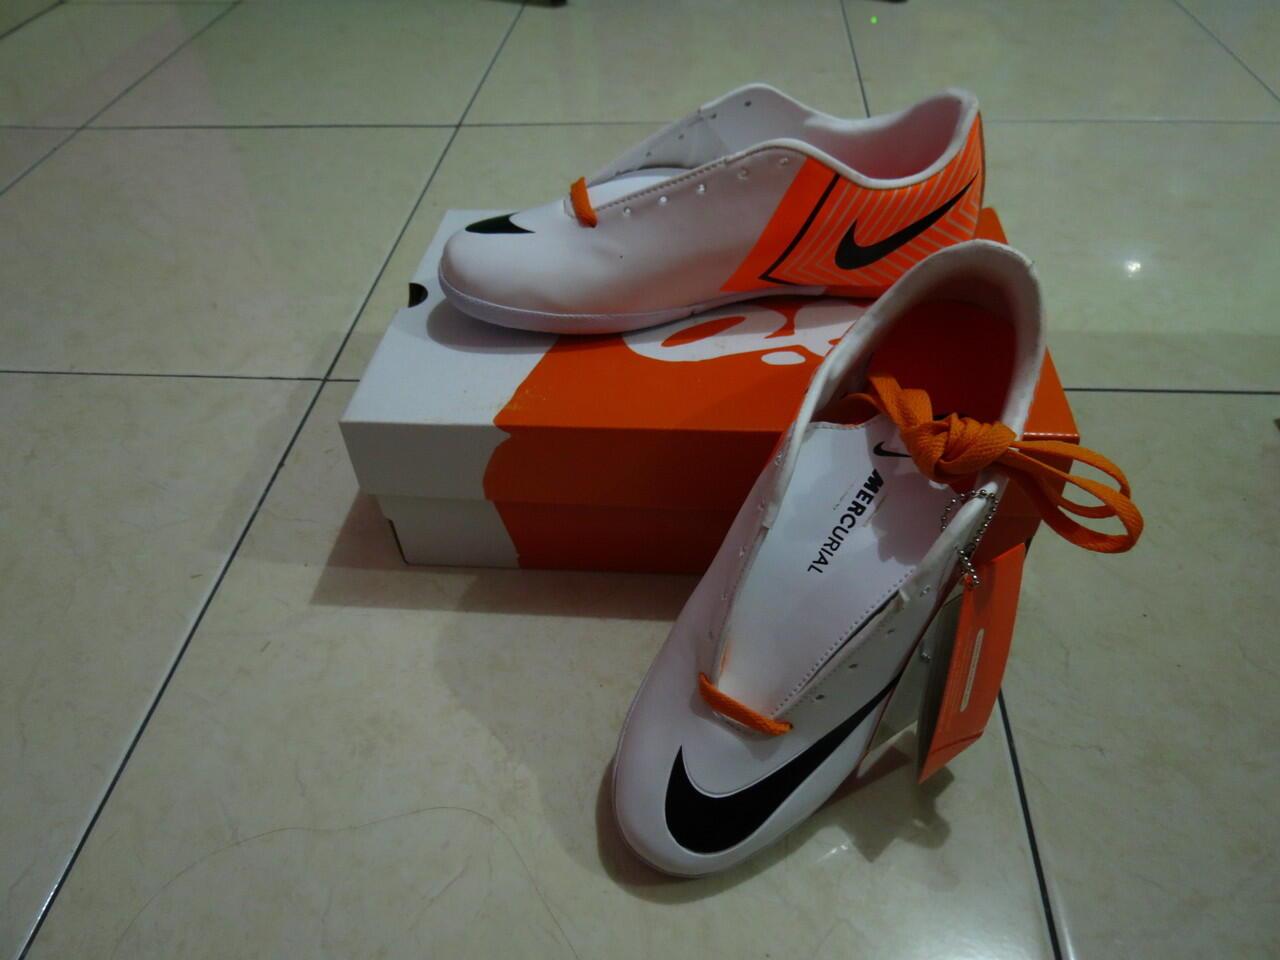 ... jual sepatu futsal nike hypervenom   nike mercurial kw super made in  vietnam(bandung) 2be6123389